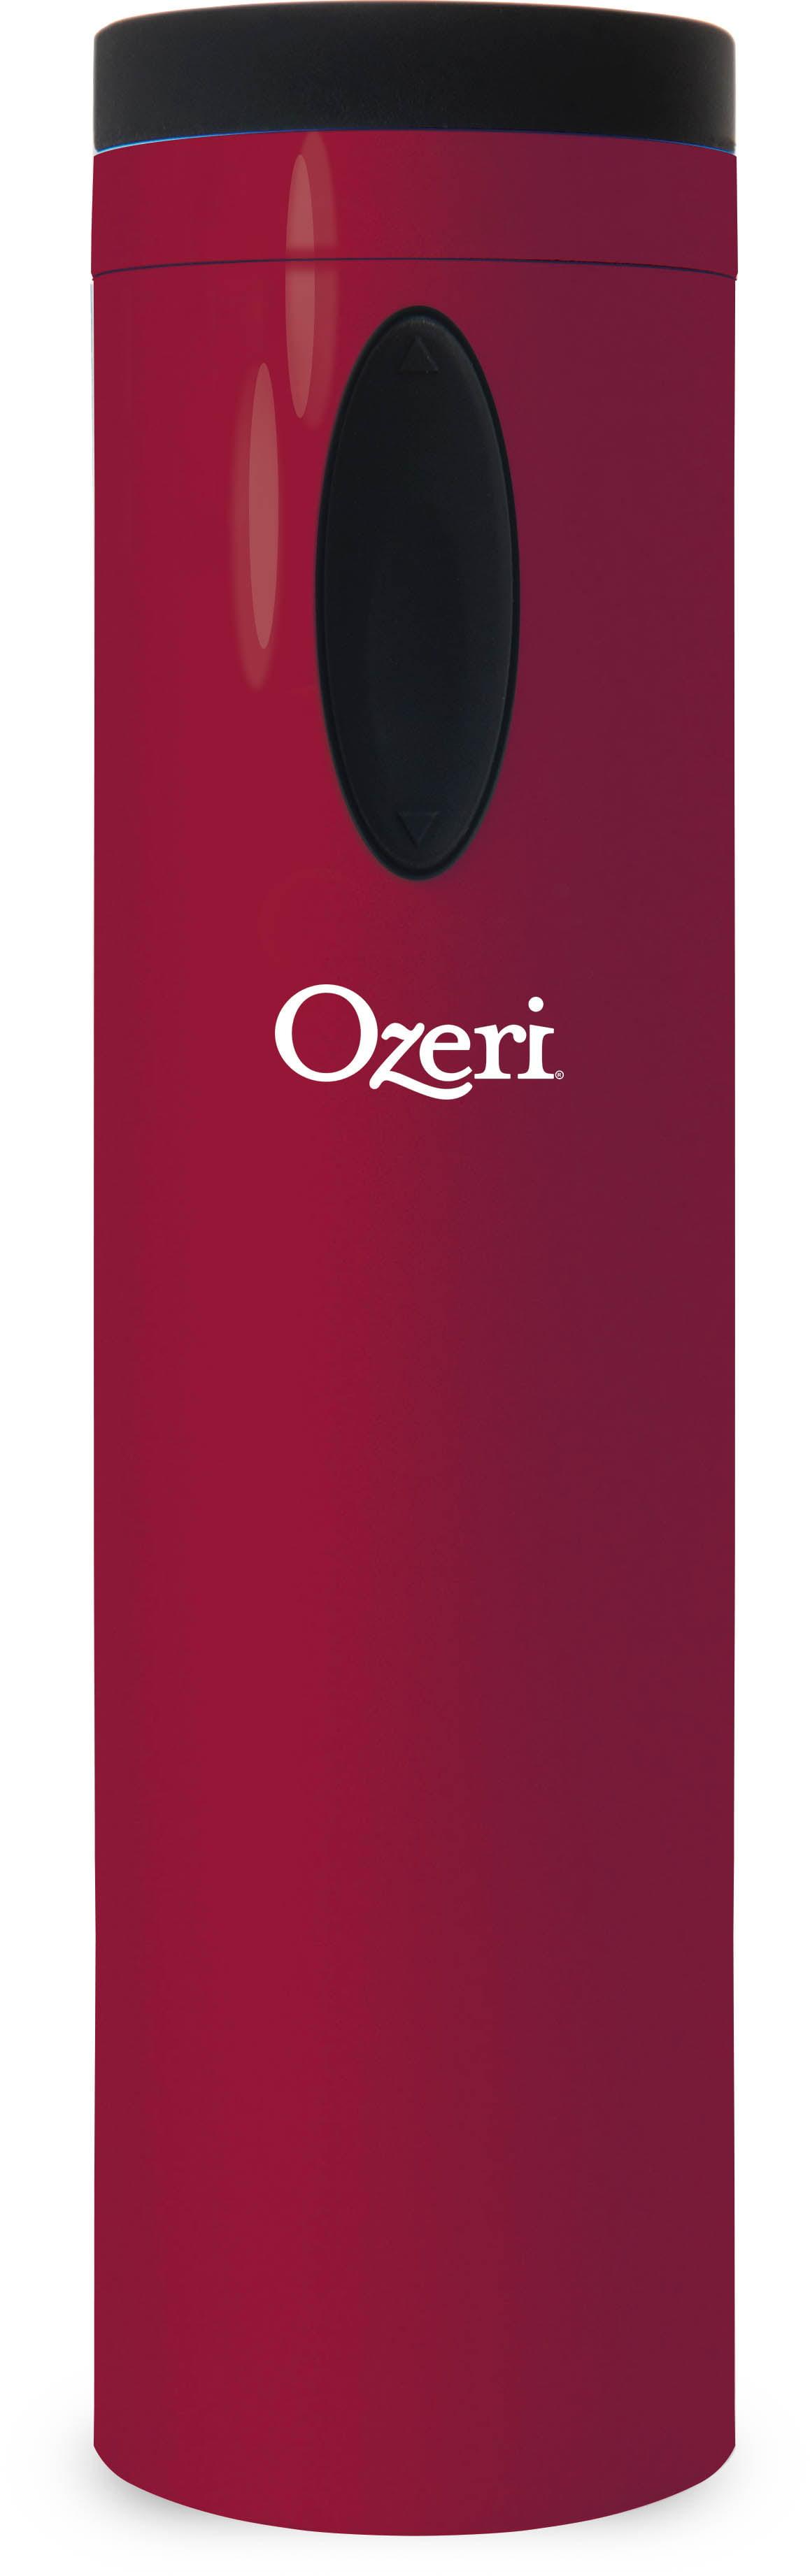 Ozeri Fascina Electric Wine Bottle Opener and Corkscrew by OZERI